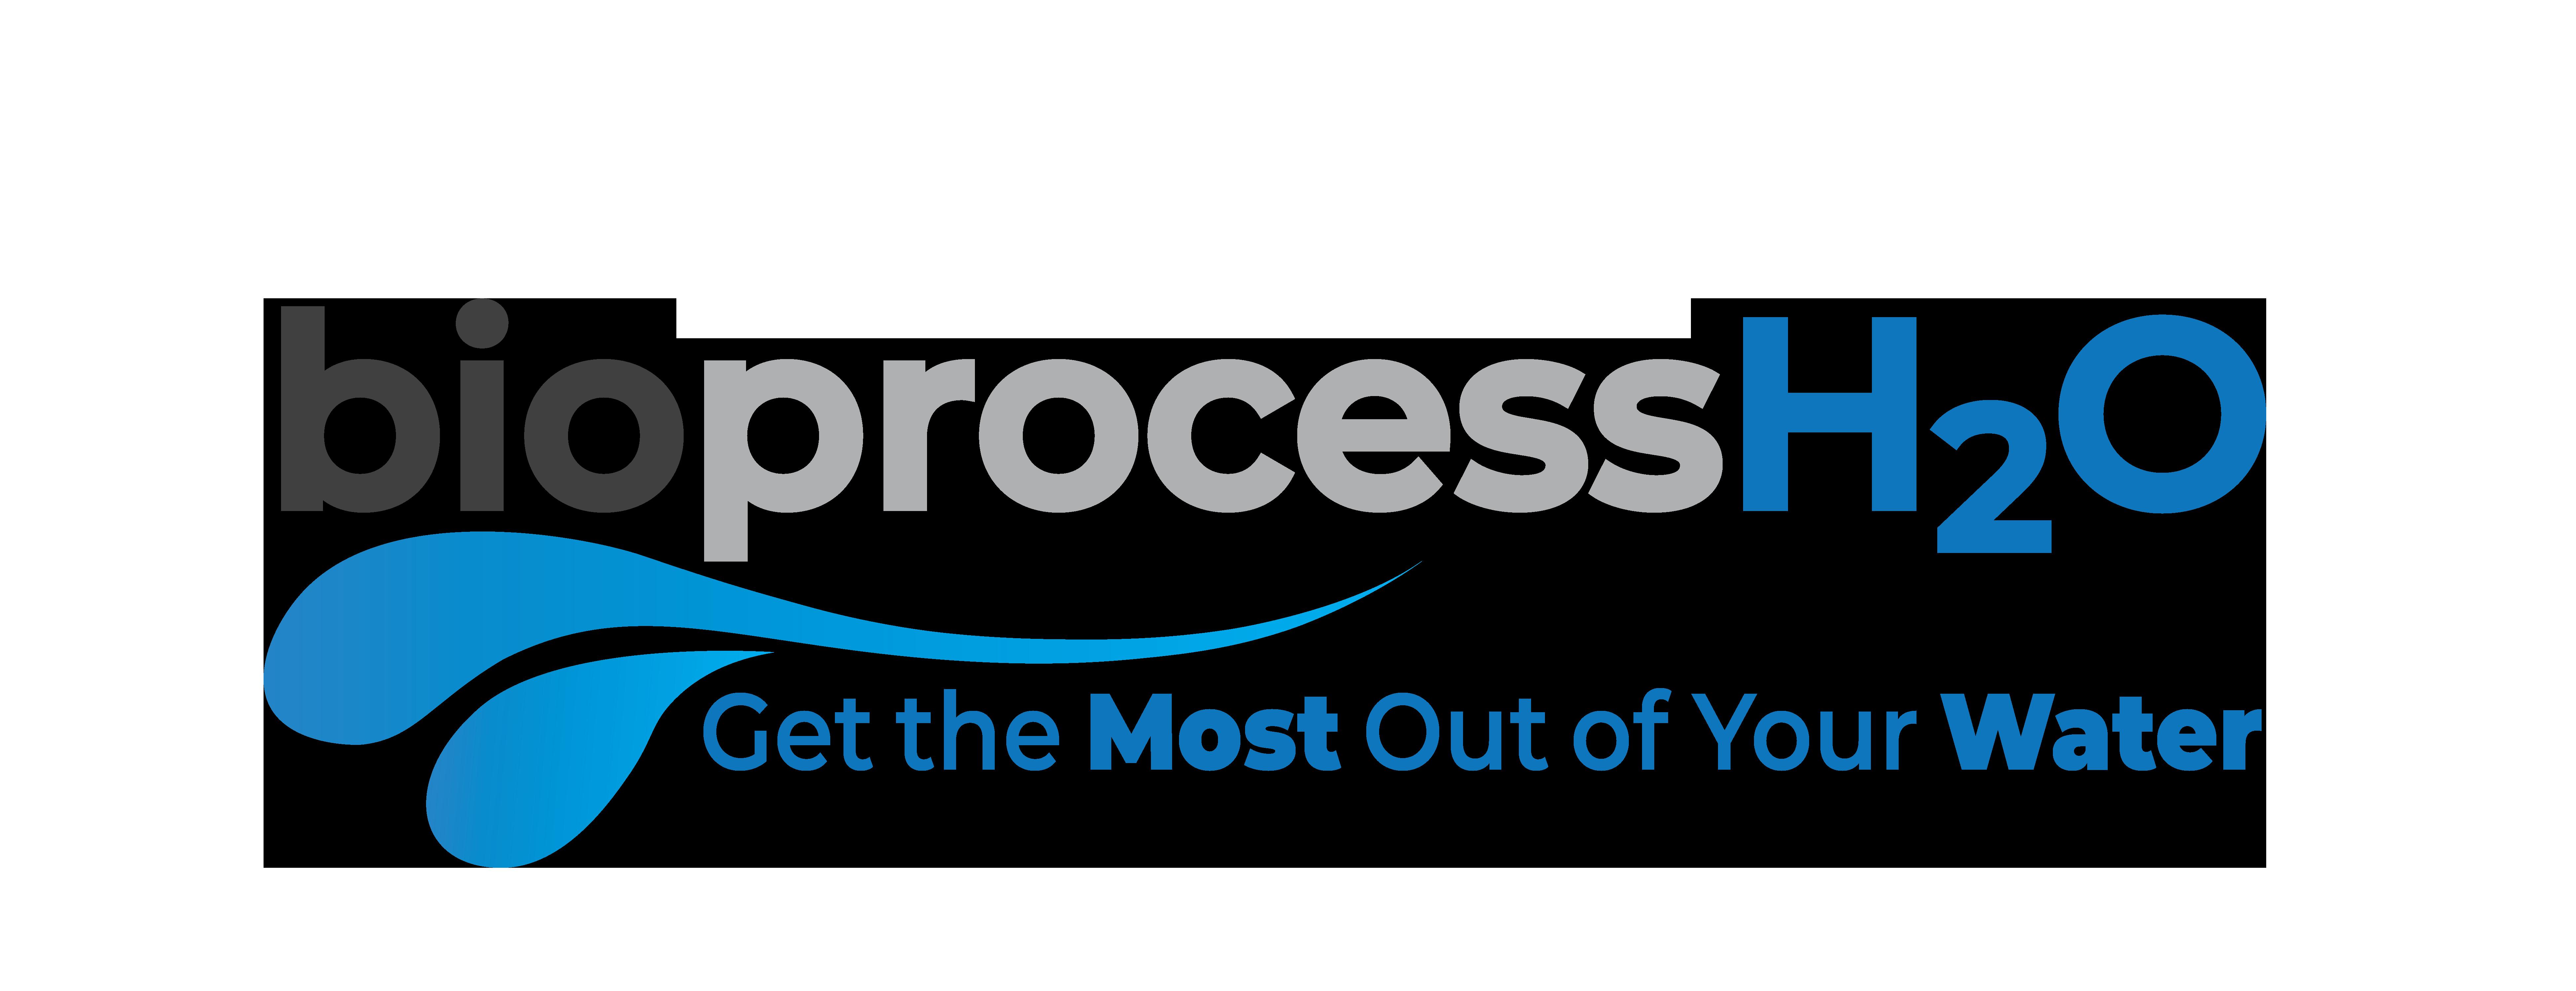 bioprocessh20's Logo